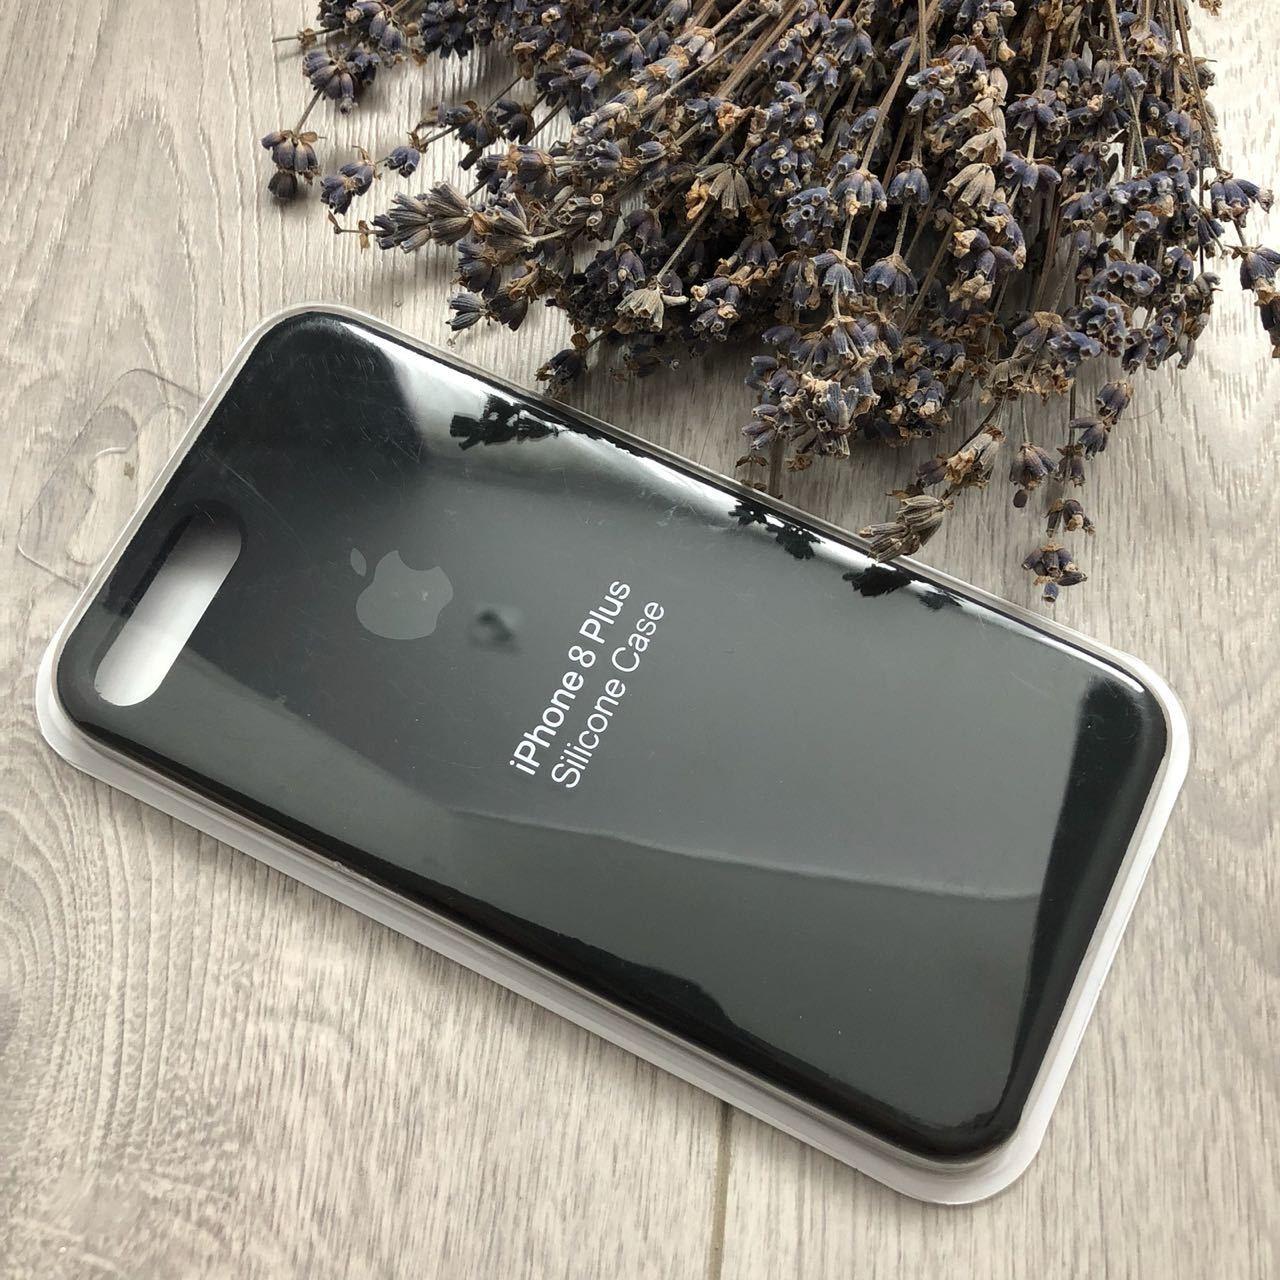 iPhone 7 Plus / 8 Plus Silicone Case (Темно Серый)